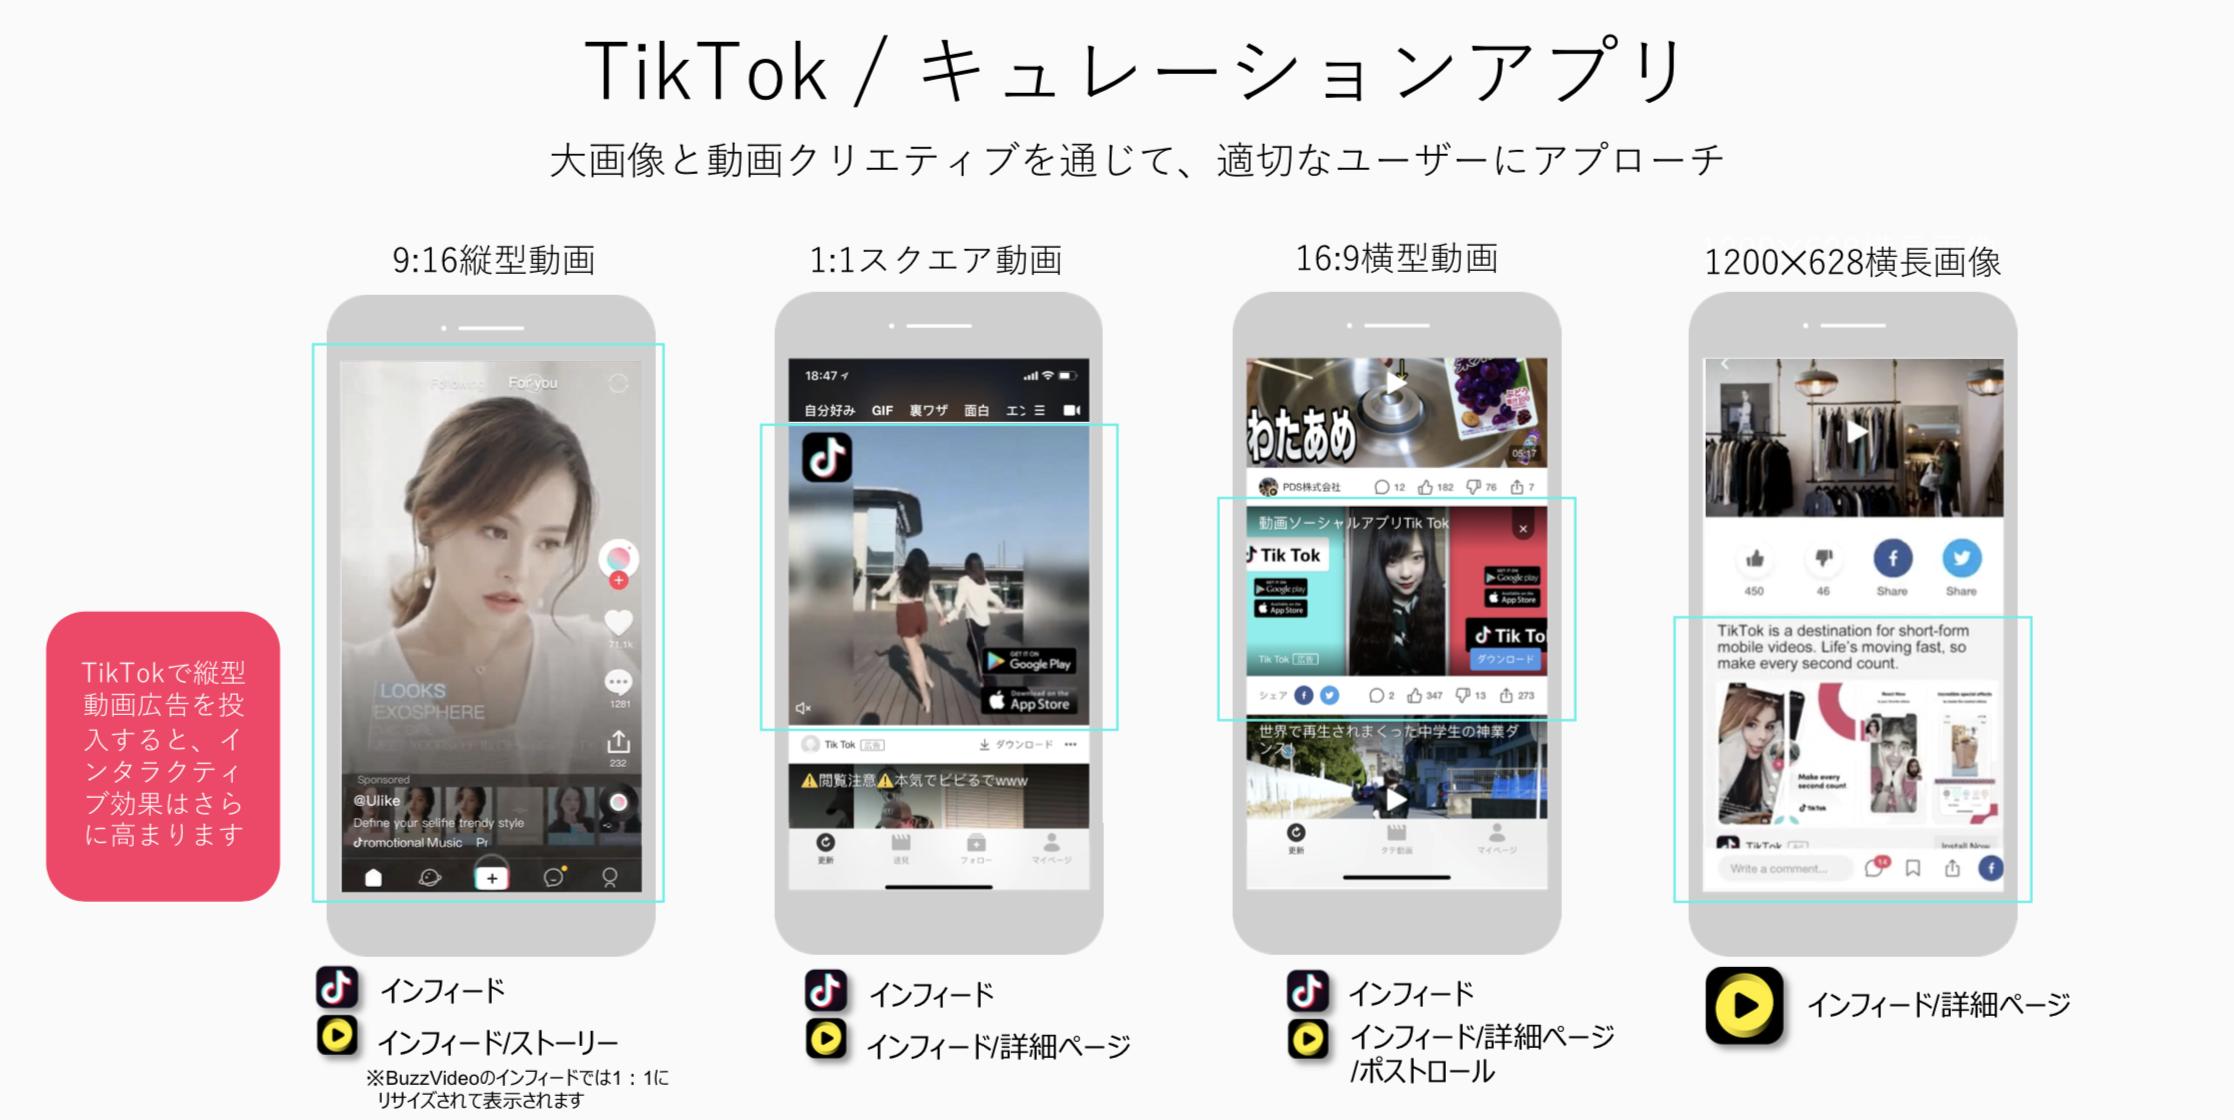 TikTok(ティックトック)の運用広告って?